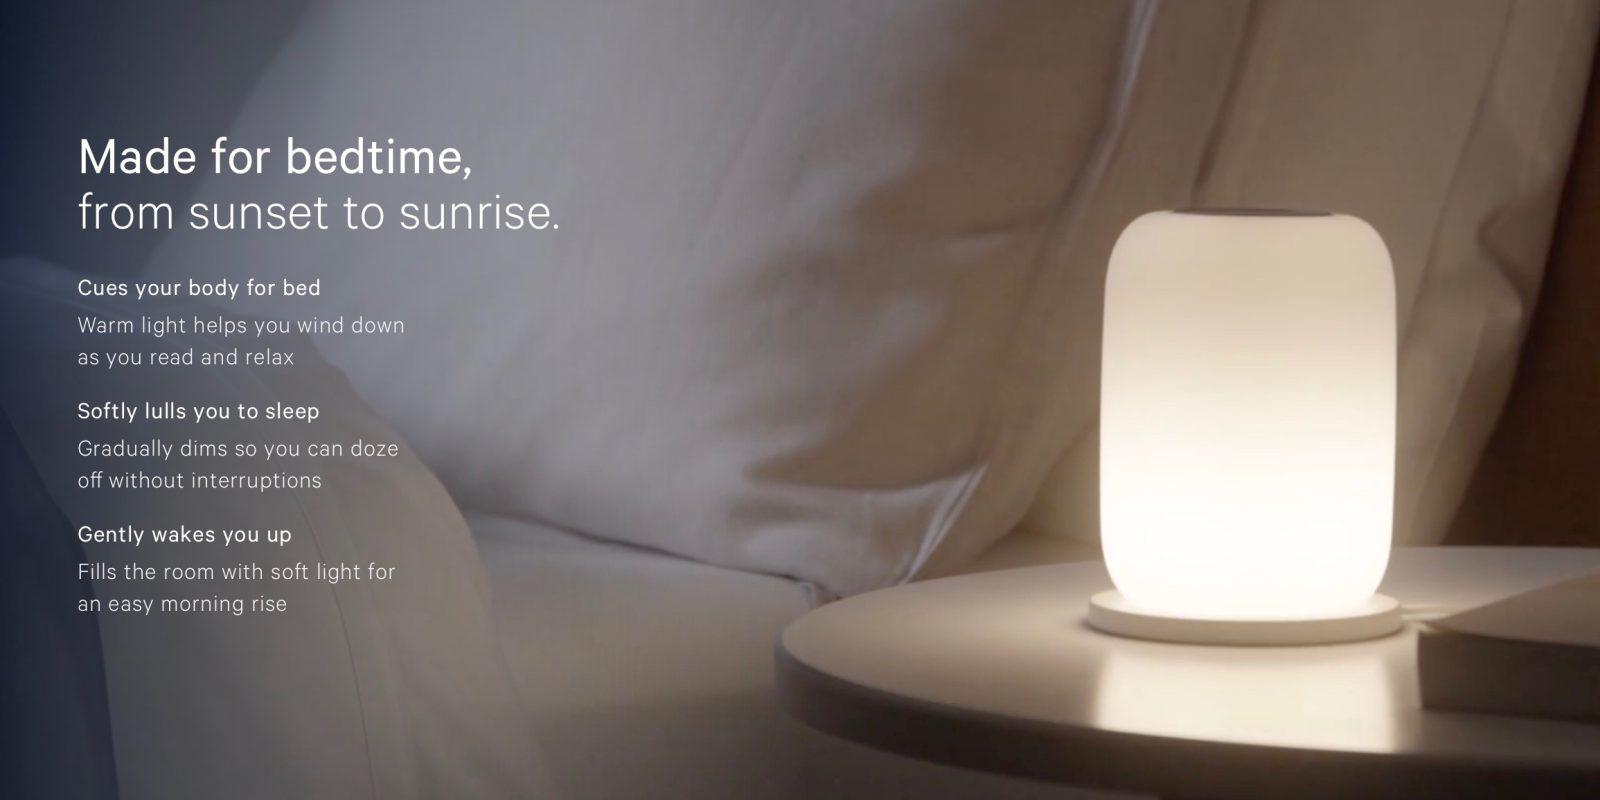 casper glow light brand value marketing strategies